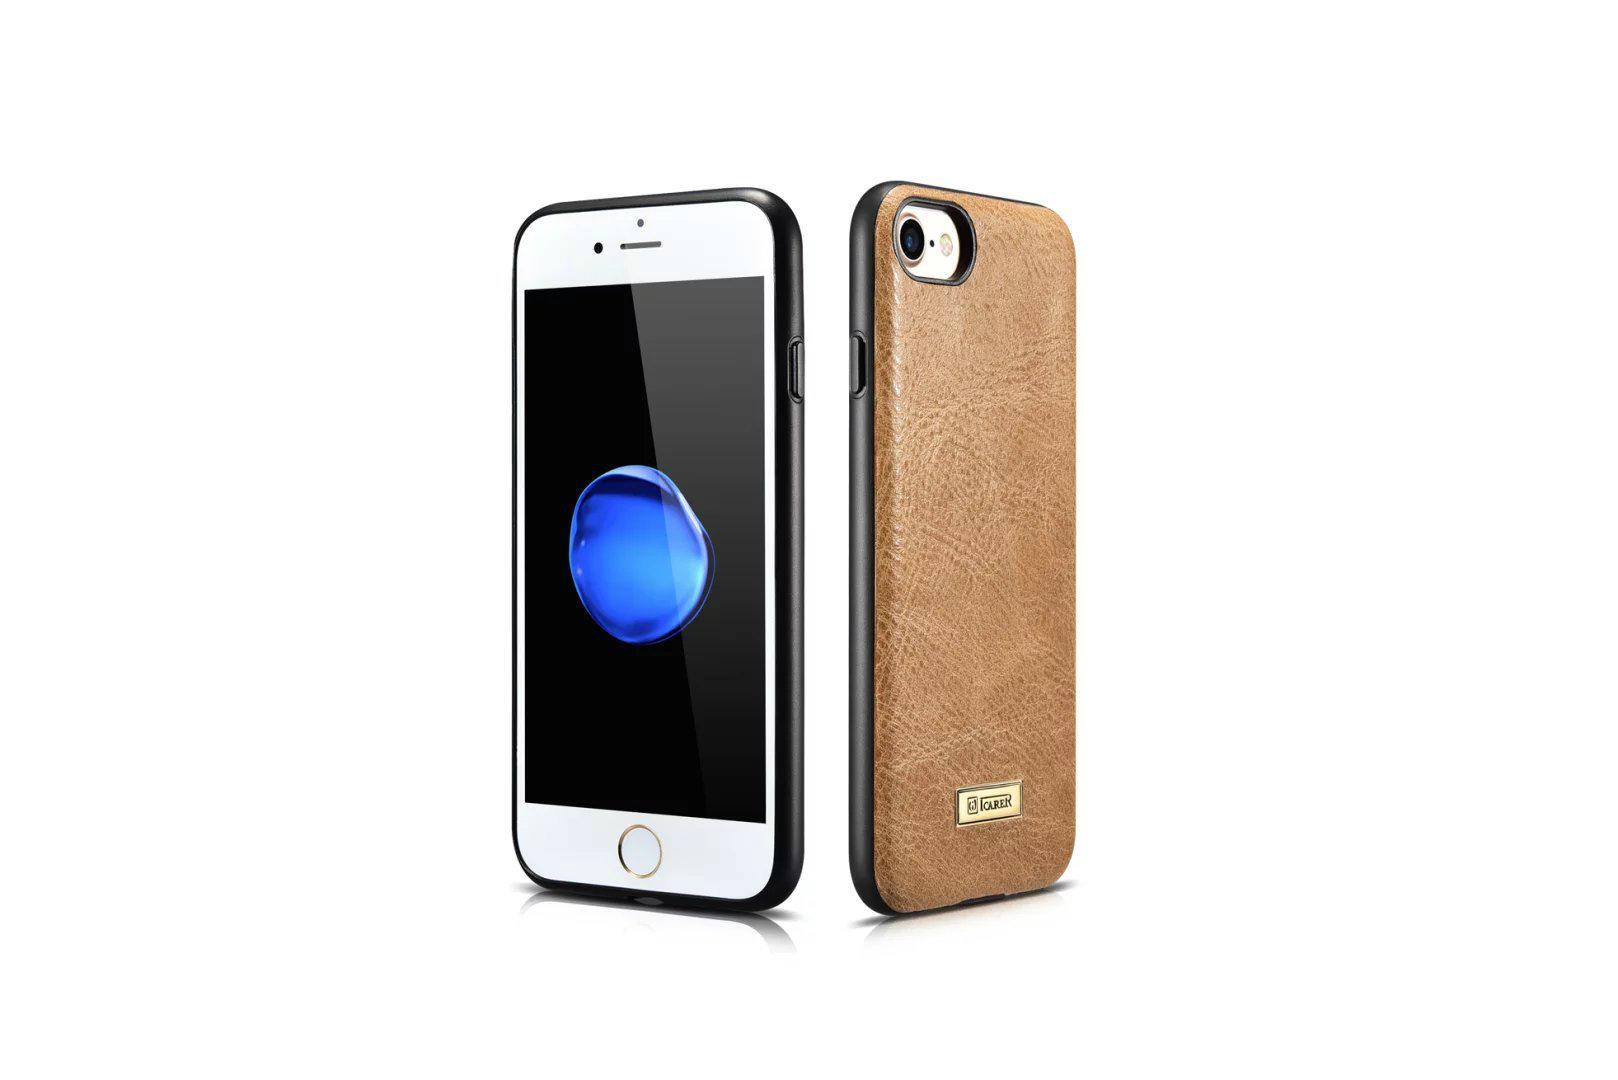 iCarer iPhone 7 Shenzhou Genuine Leather Fashional Back Cover Case 7